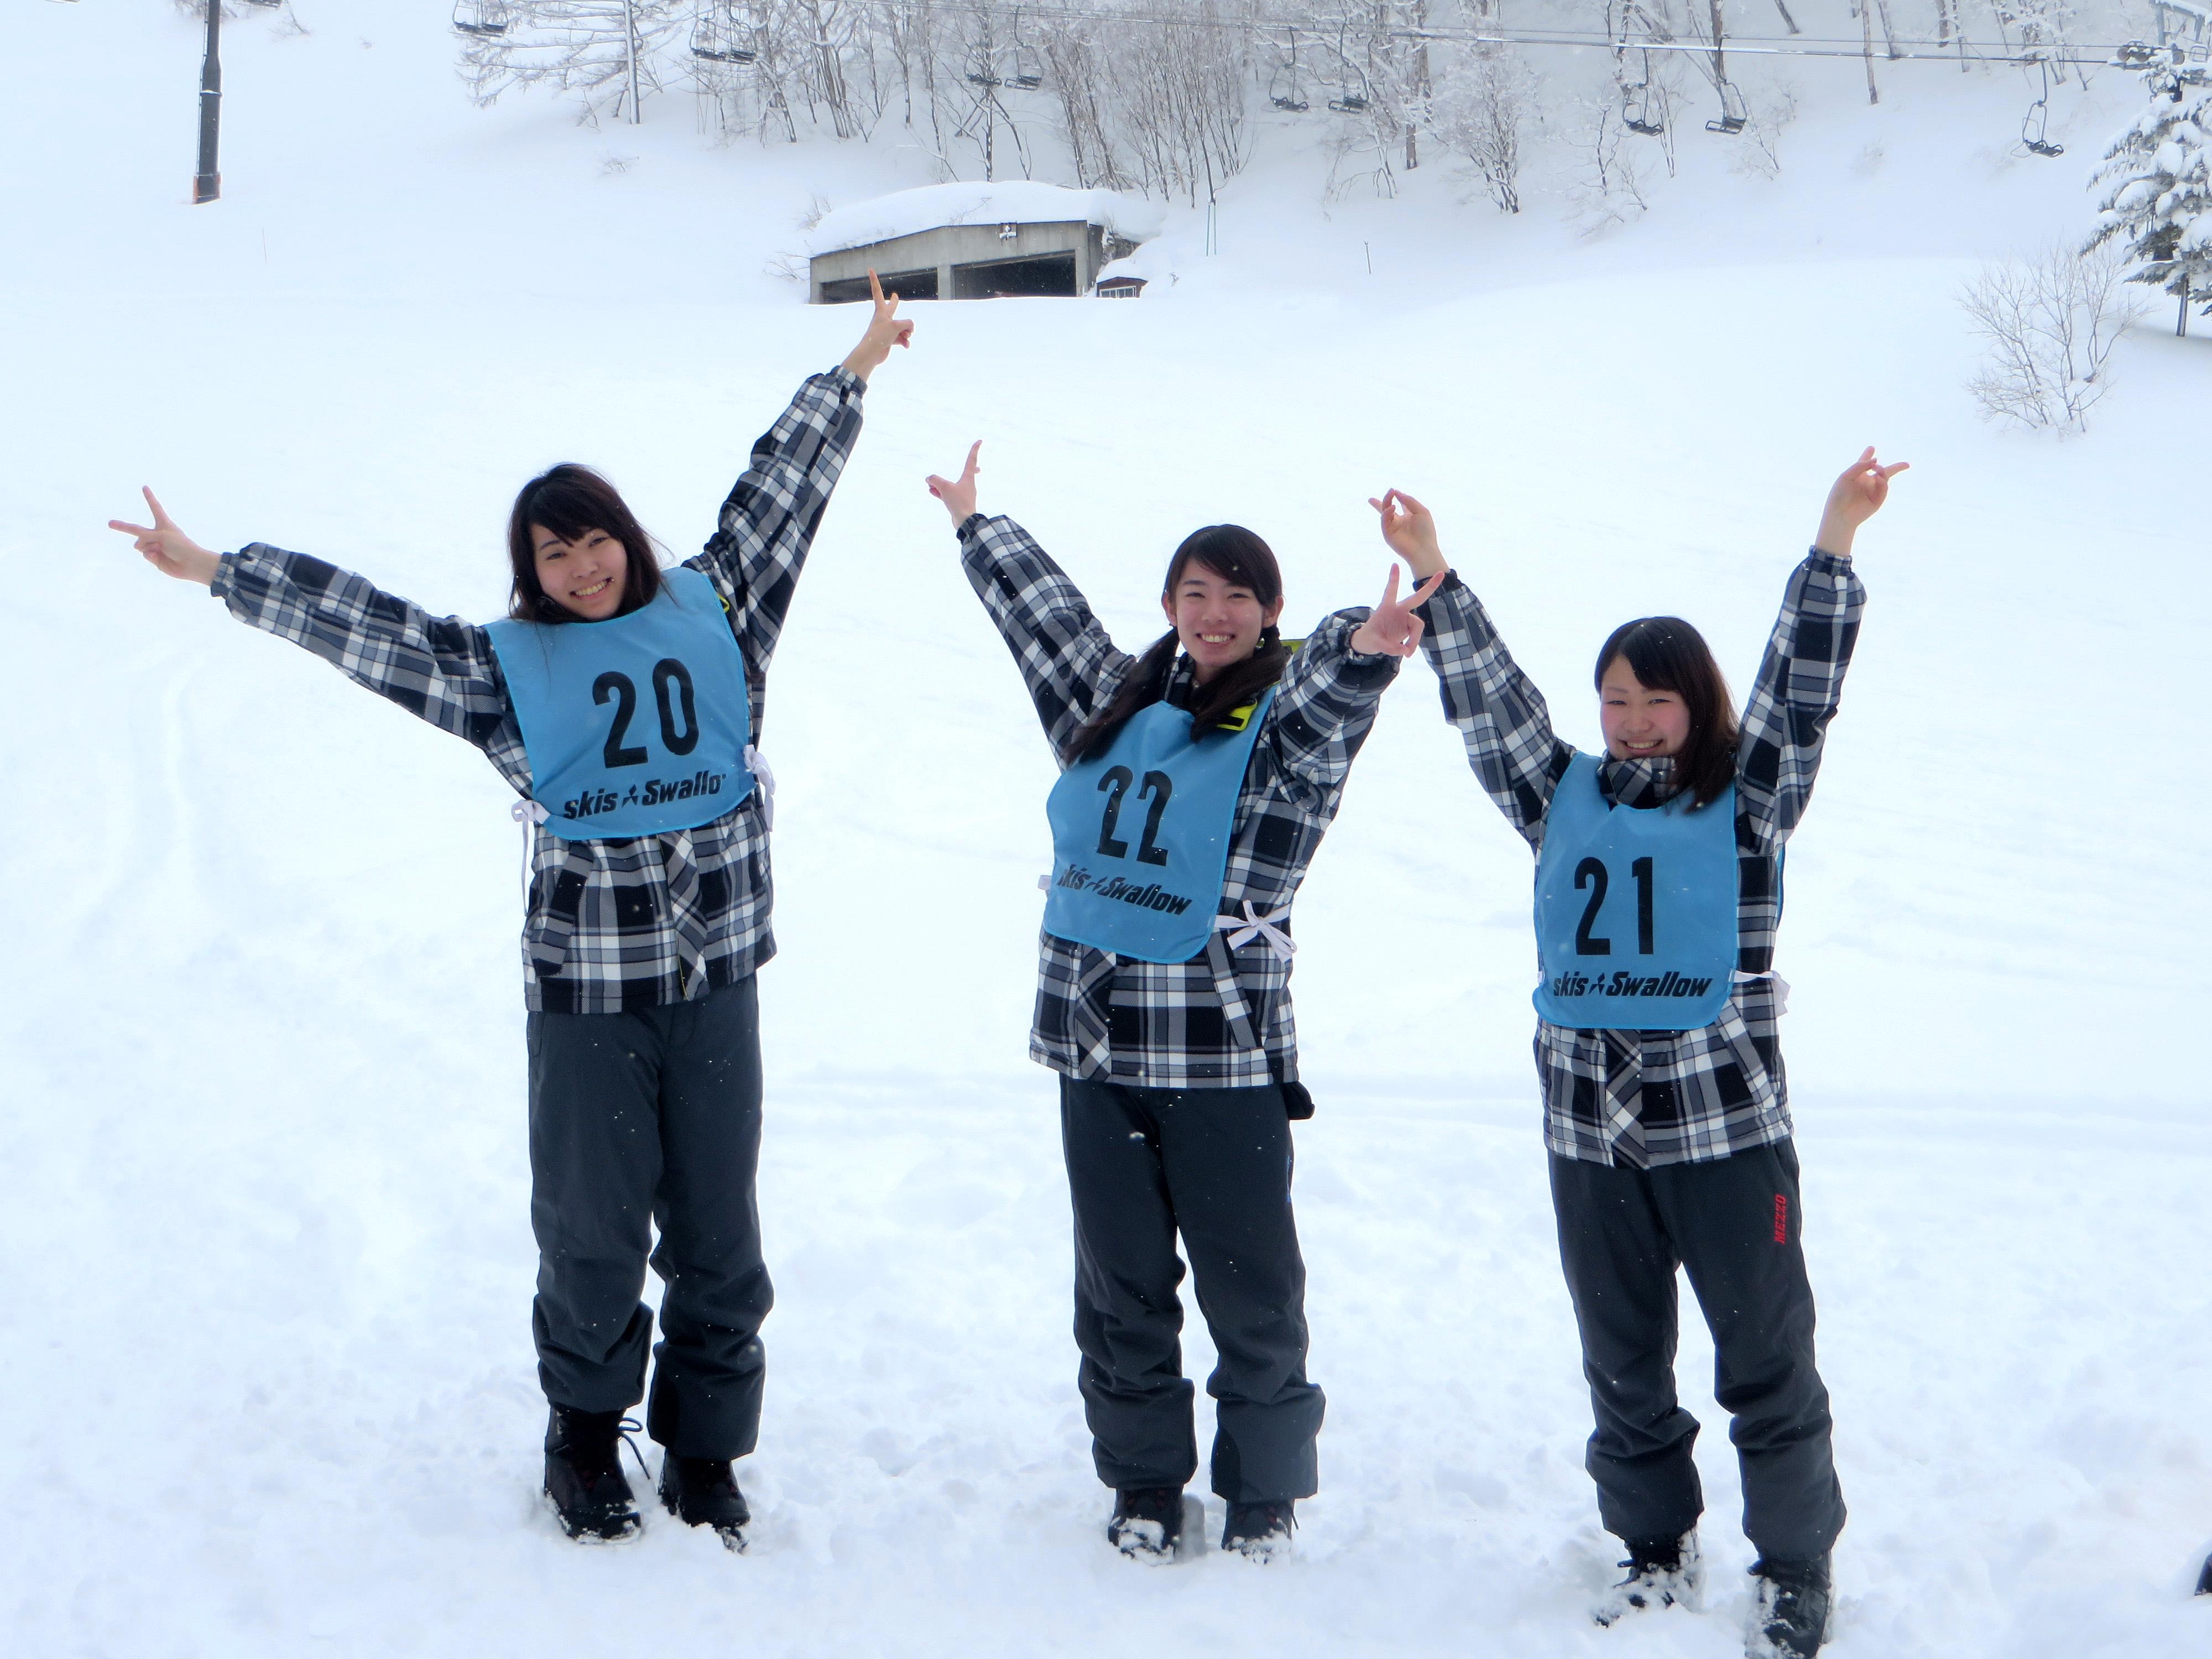 http://www.edusys.jp/mukogawa-u/mukolog/IMG_2458.JPG